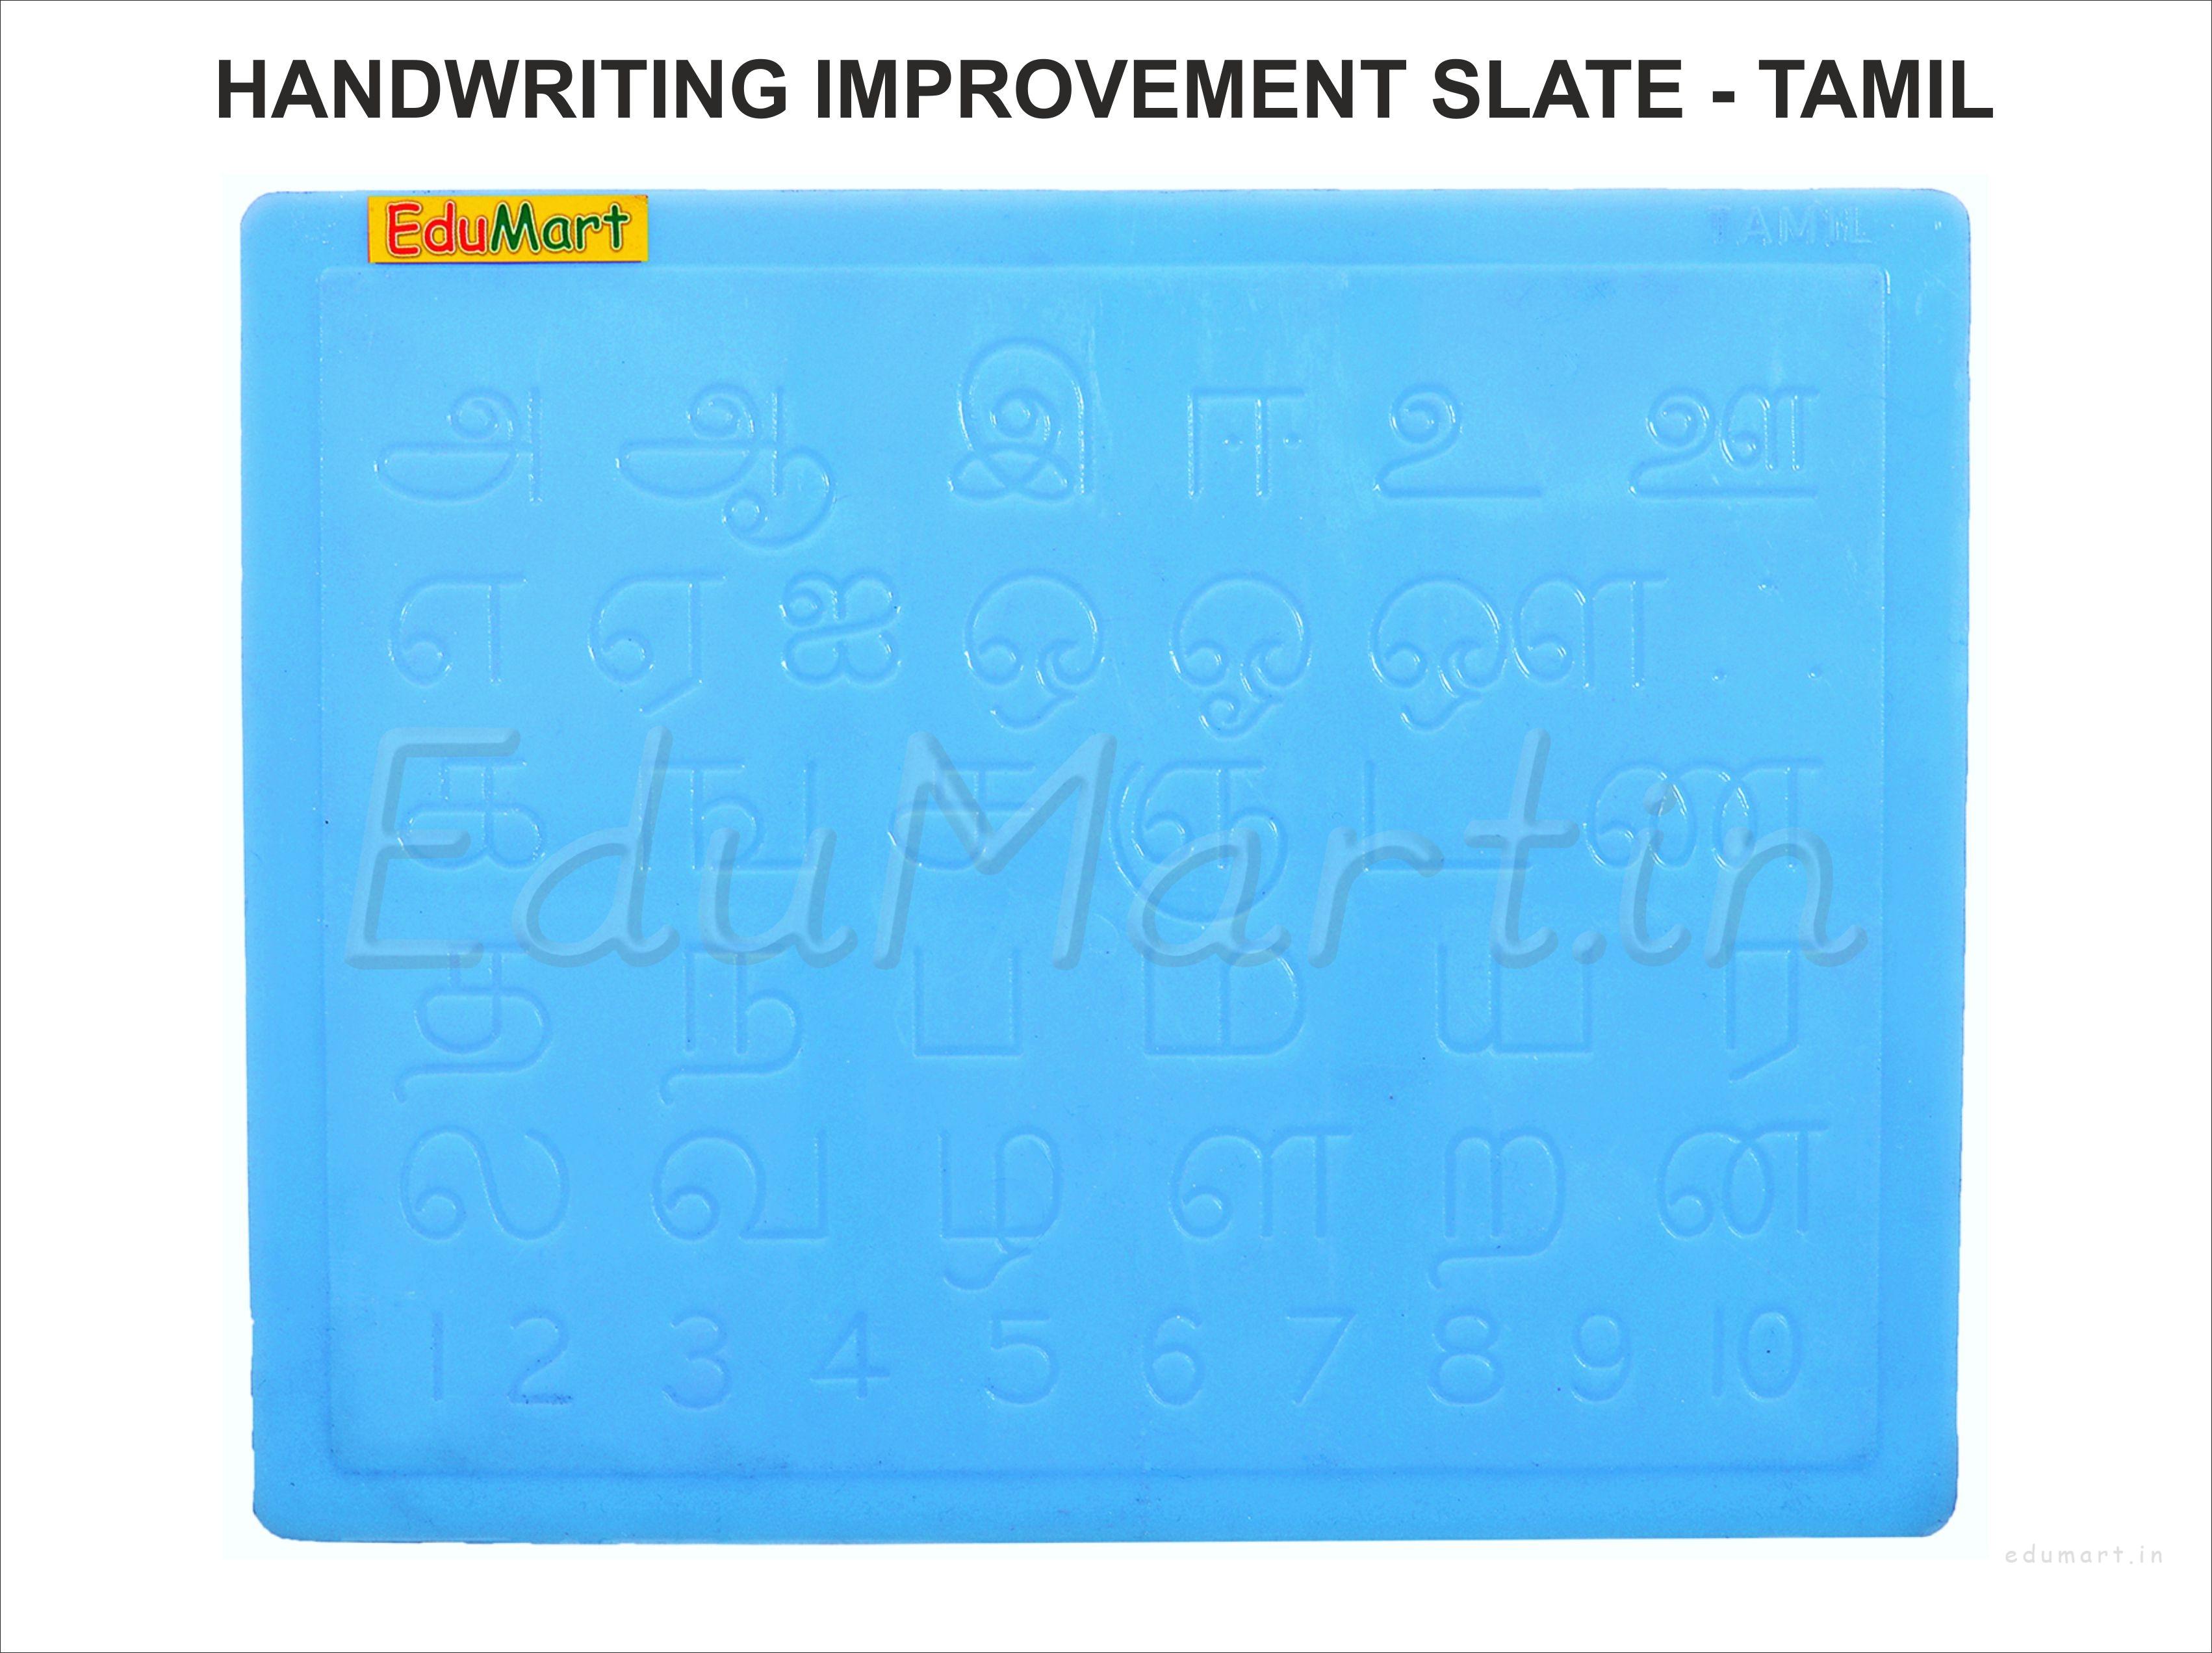 Product|Teaching Aids|Handwriting Improvement Slate Tamil Alphabet